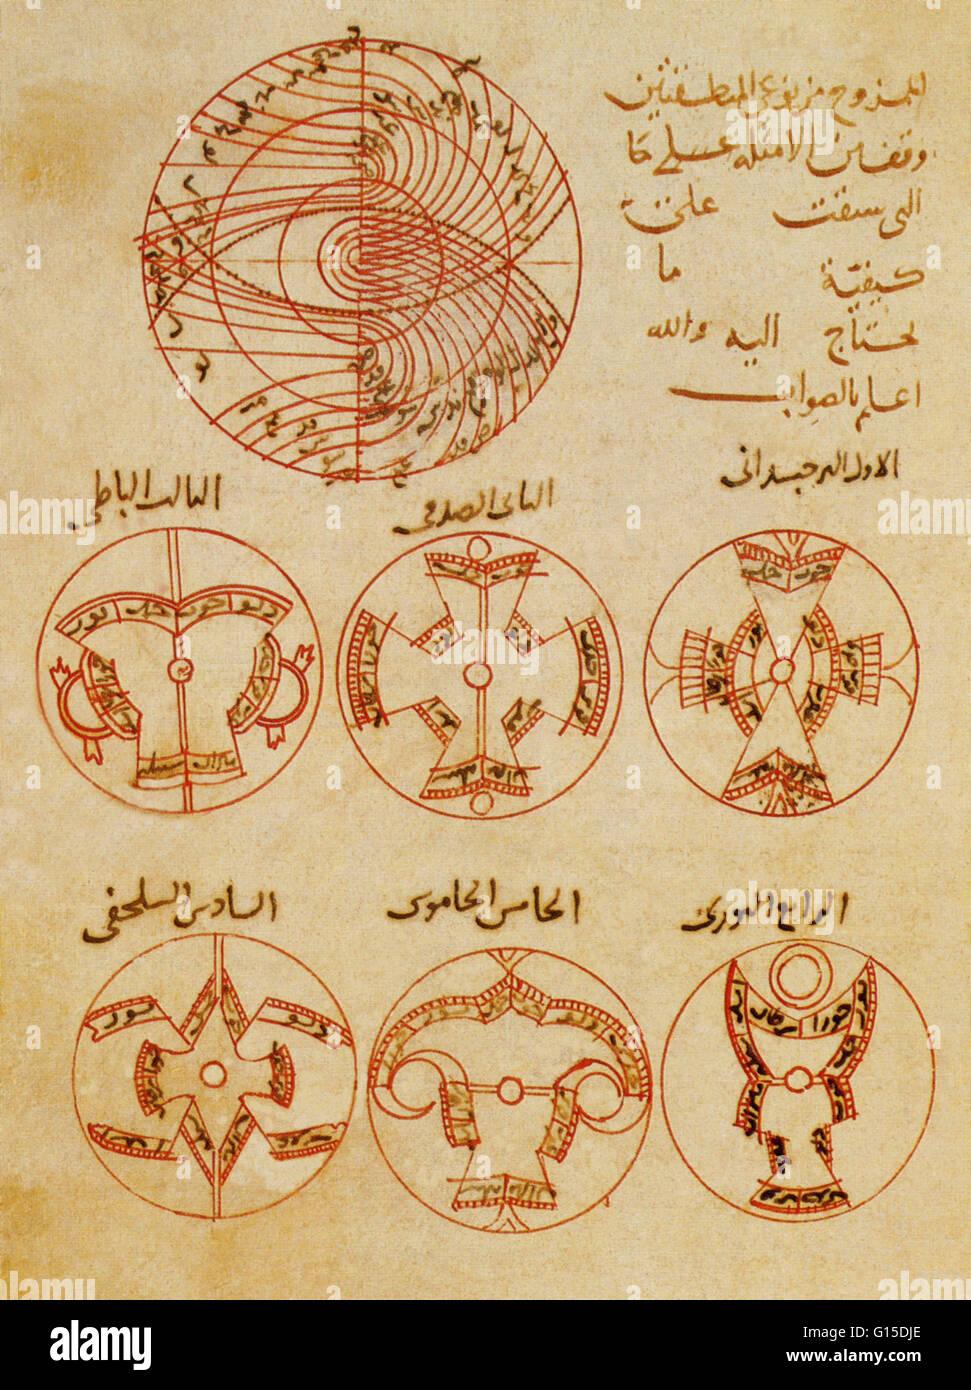 """Treatise on the Astrolabe,"" a Seljuk-illustrated Arabic manuscript in naskh script, copied by Mahmud bin Muhammad Stock Photo"